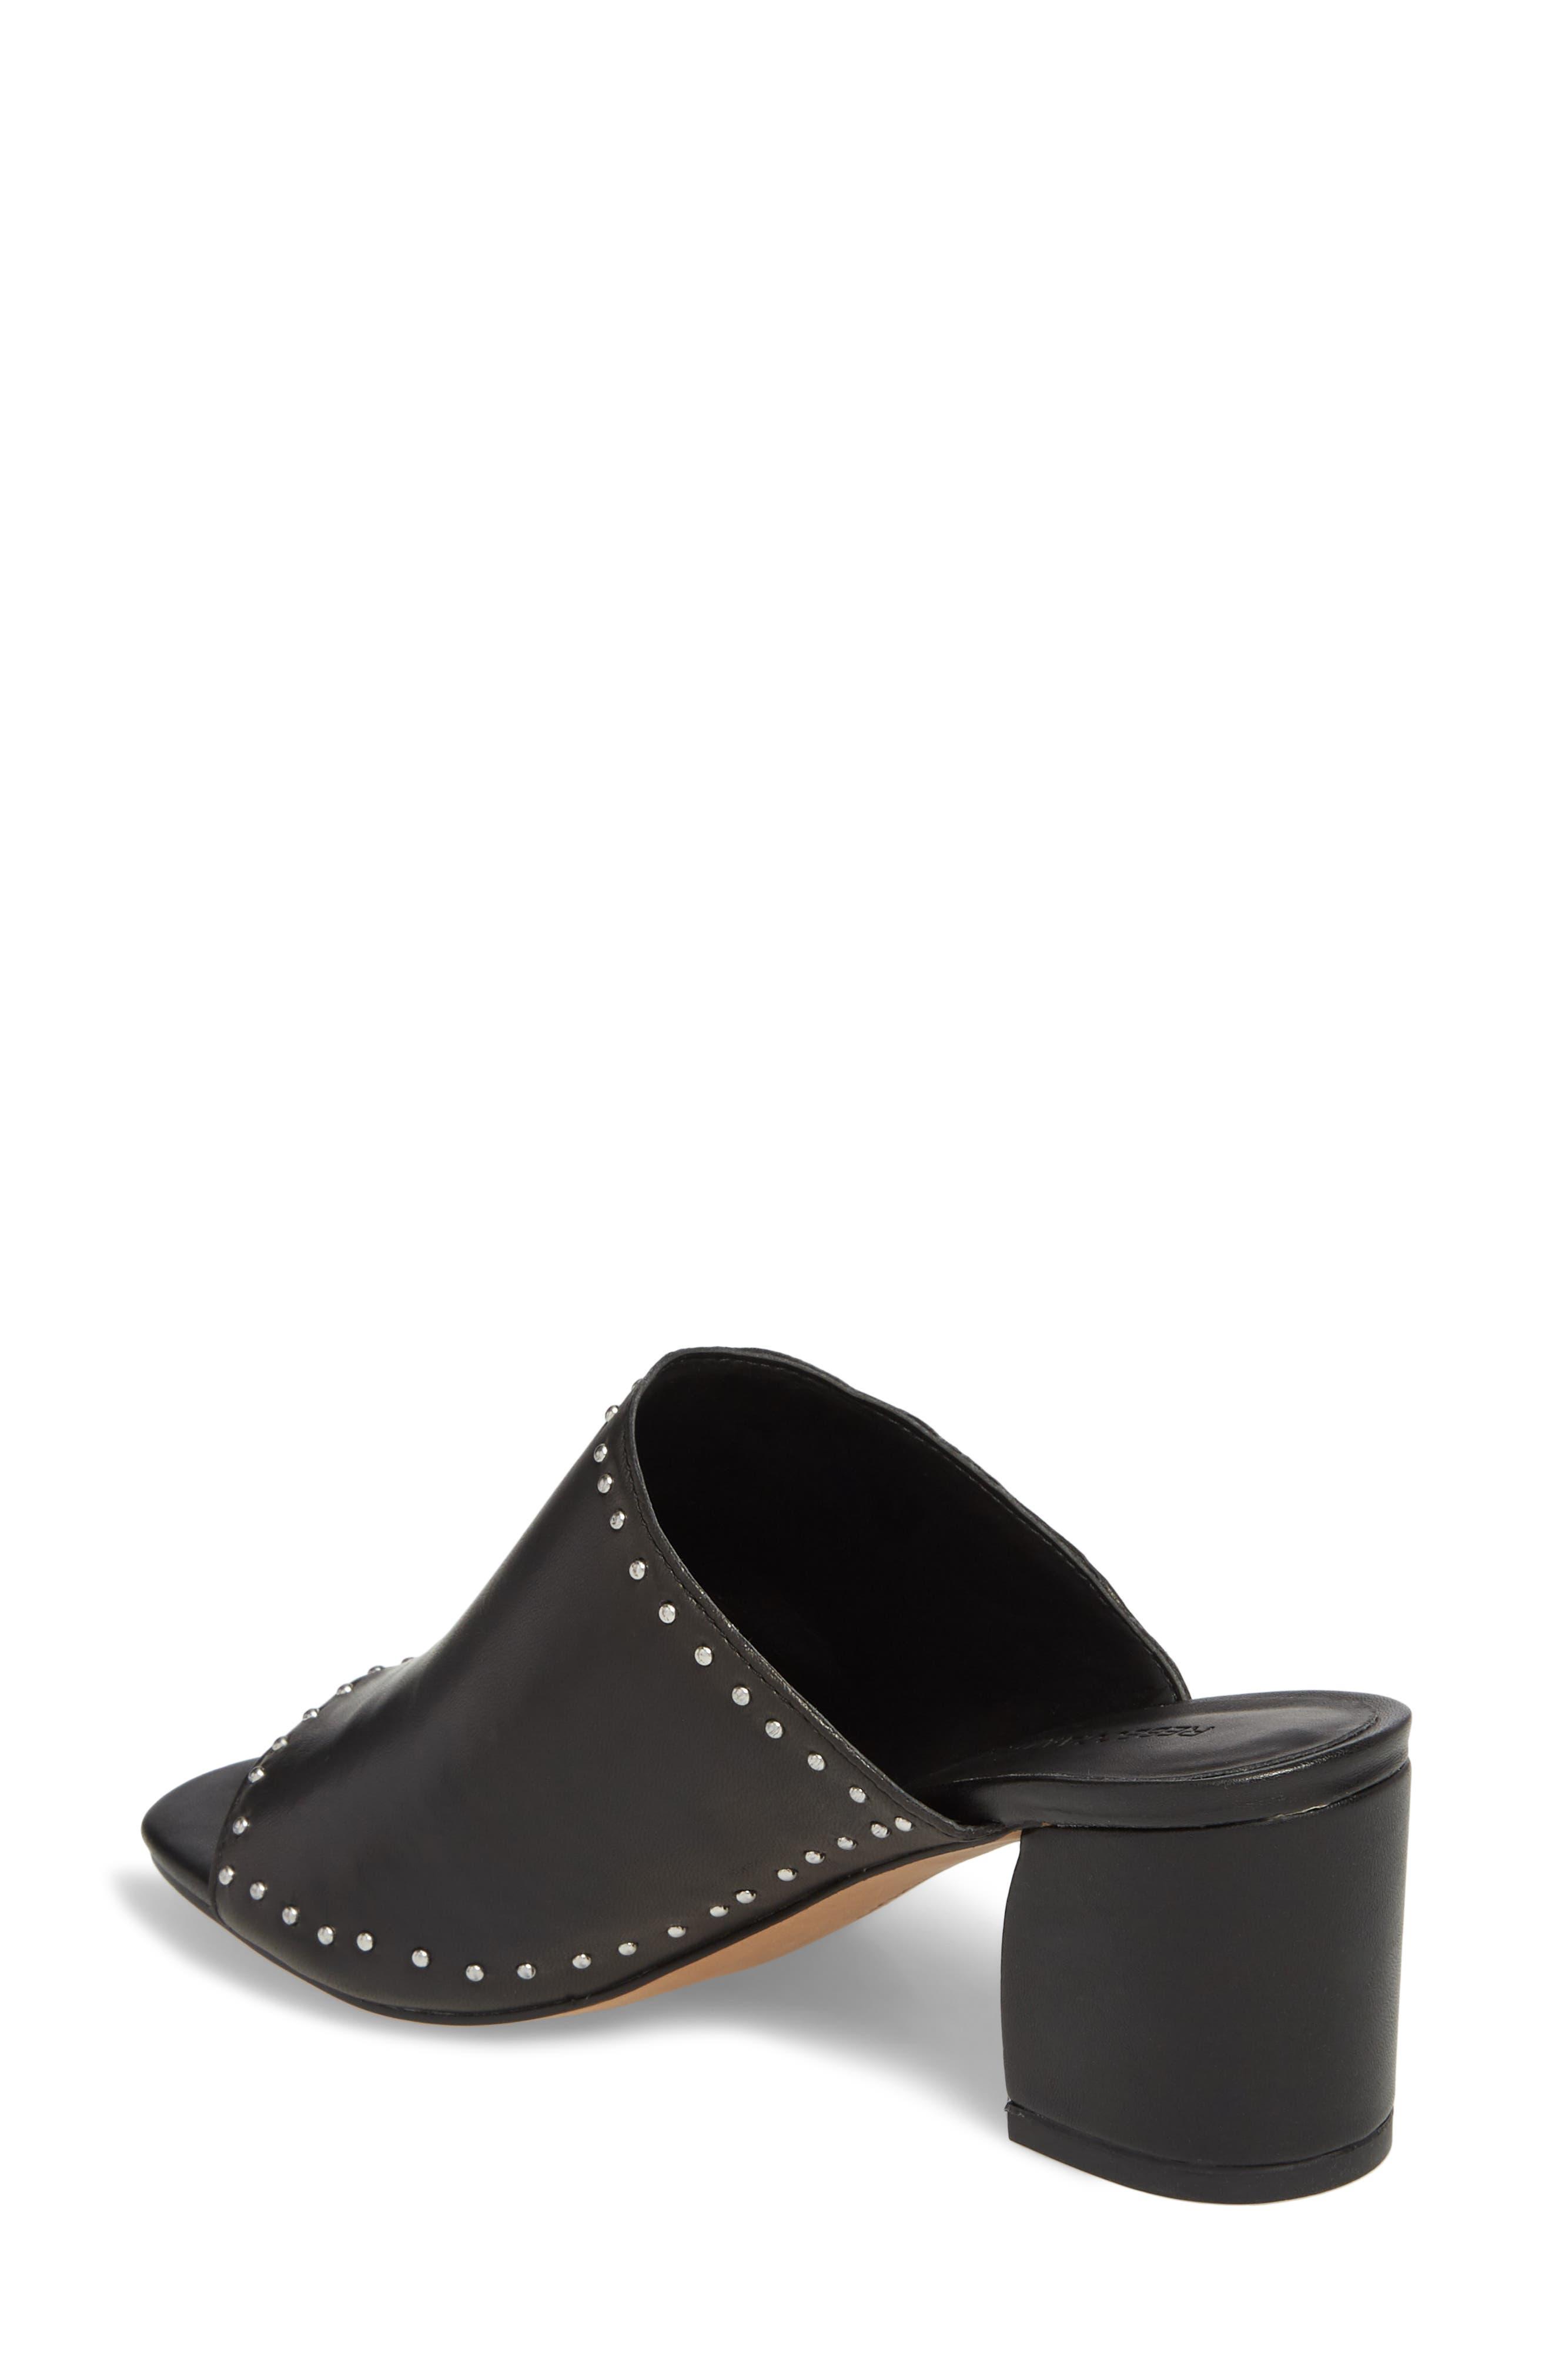 Lainy Studded Mule,                             Alternate thumbnail 2, color,                             Black Leather